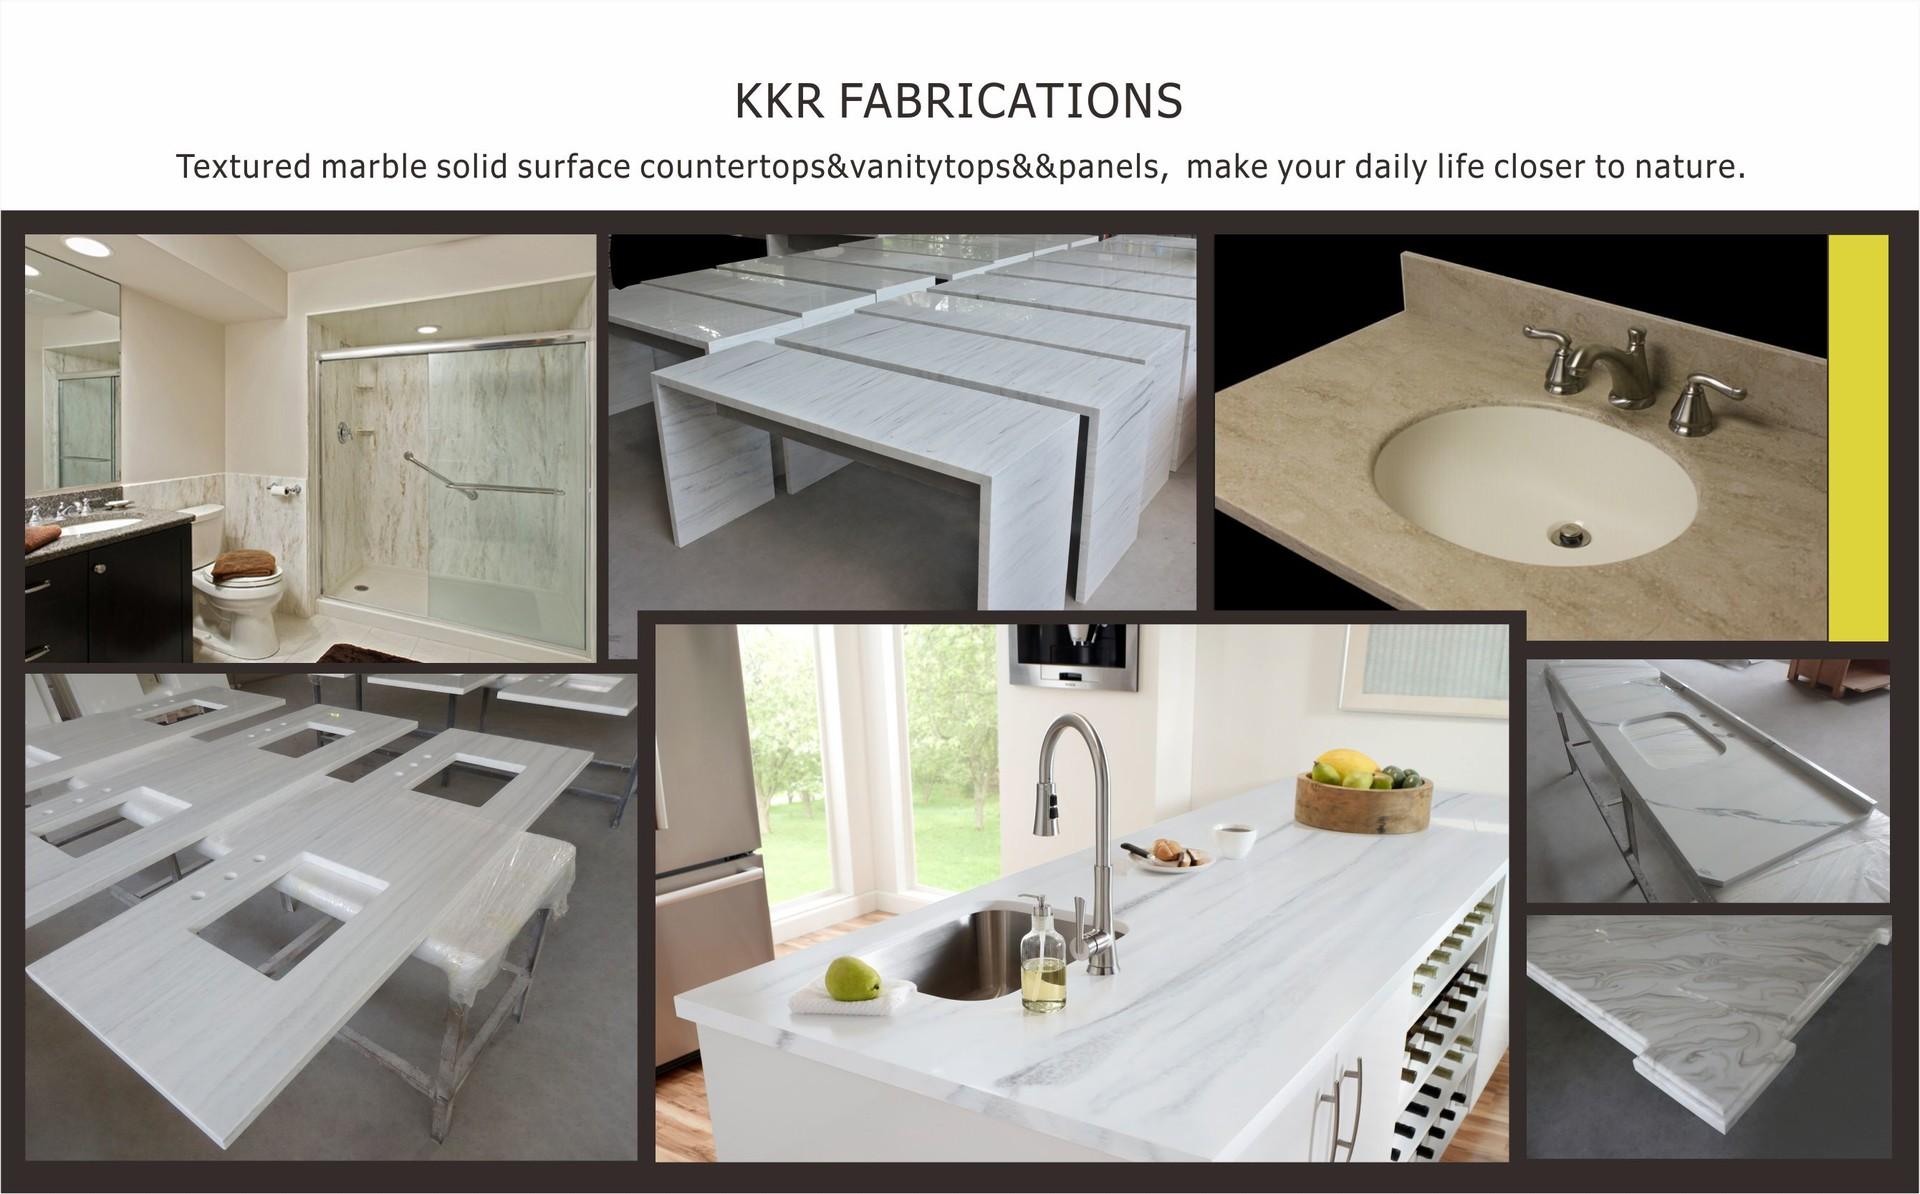 KKR FABRICATIONS